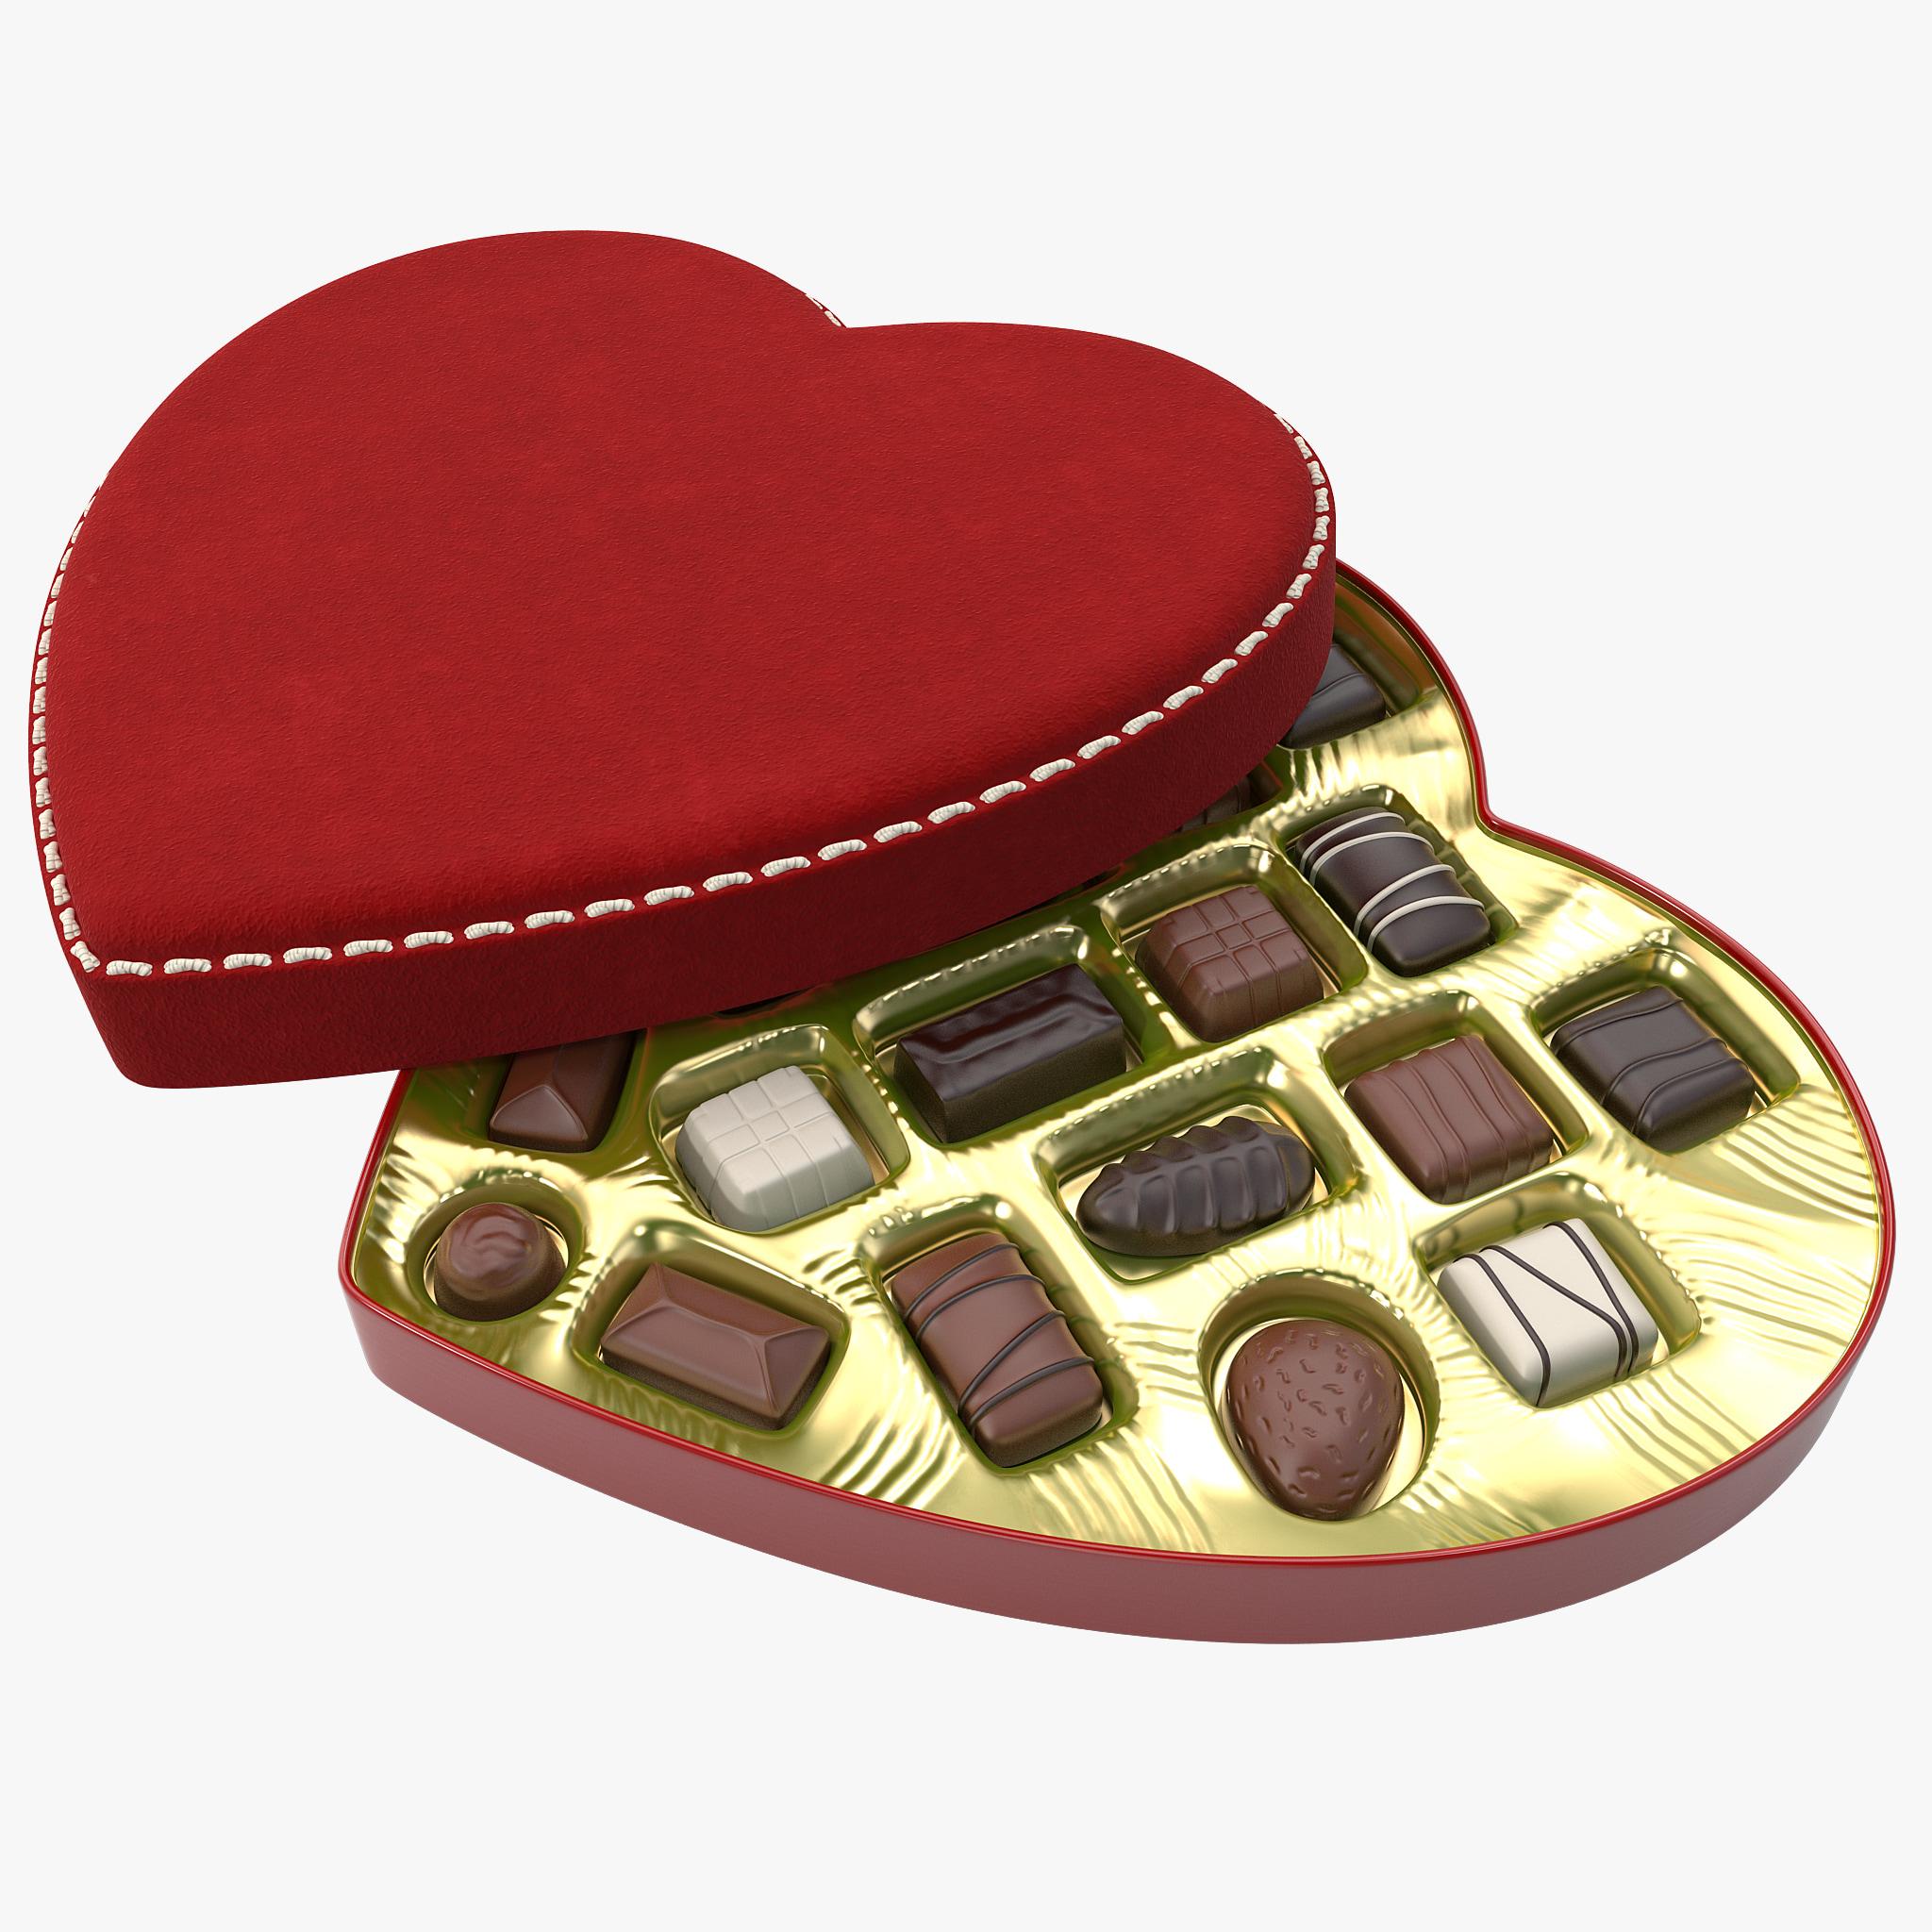 Heart Box of Chocolates_1.jpg